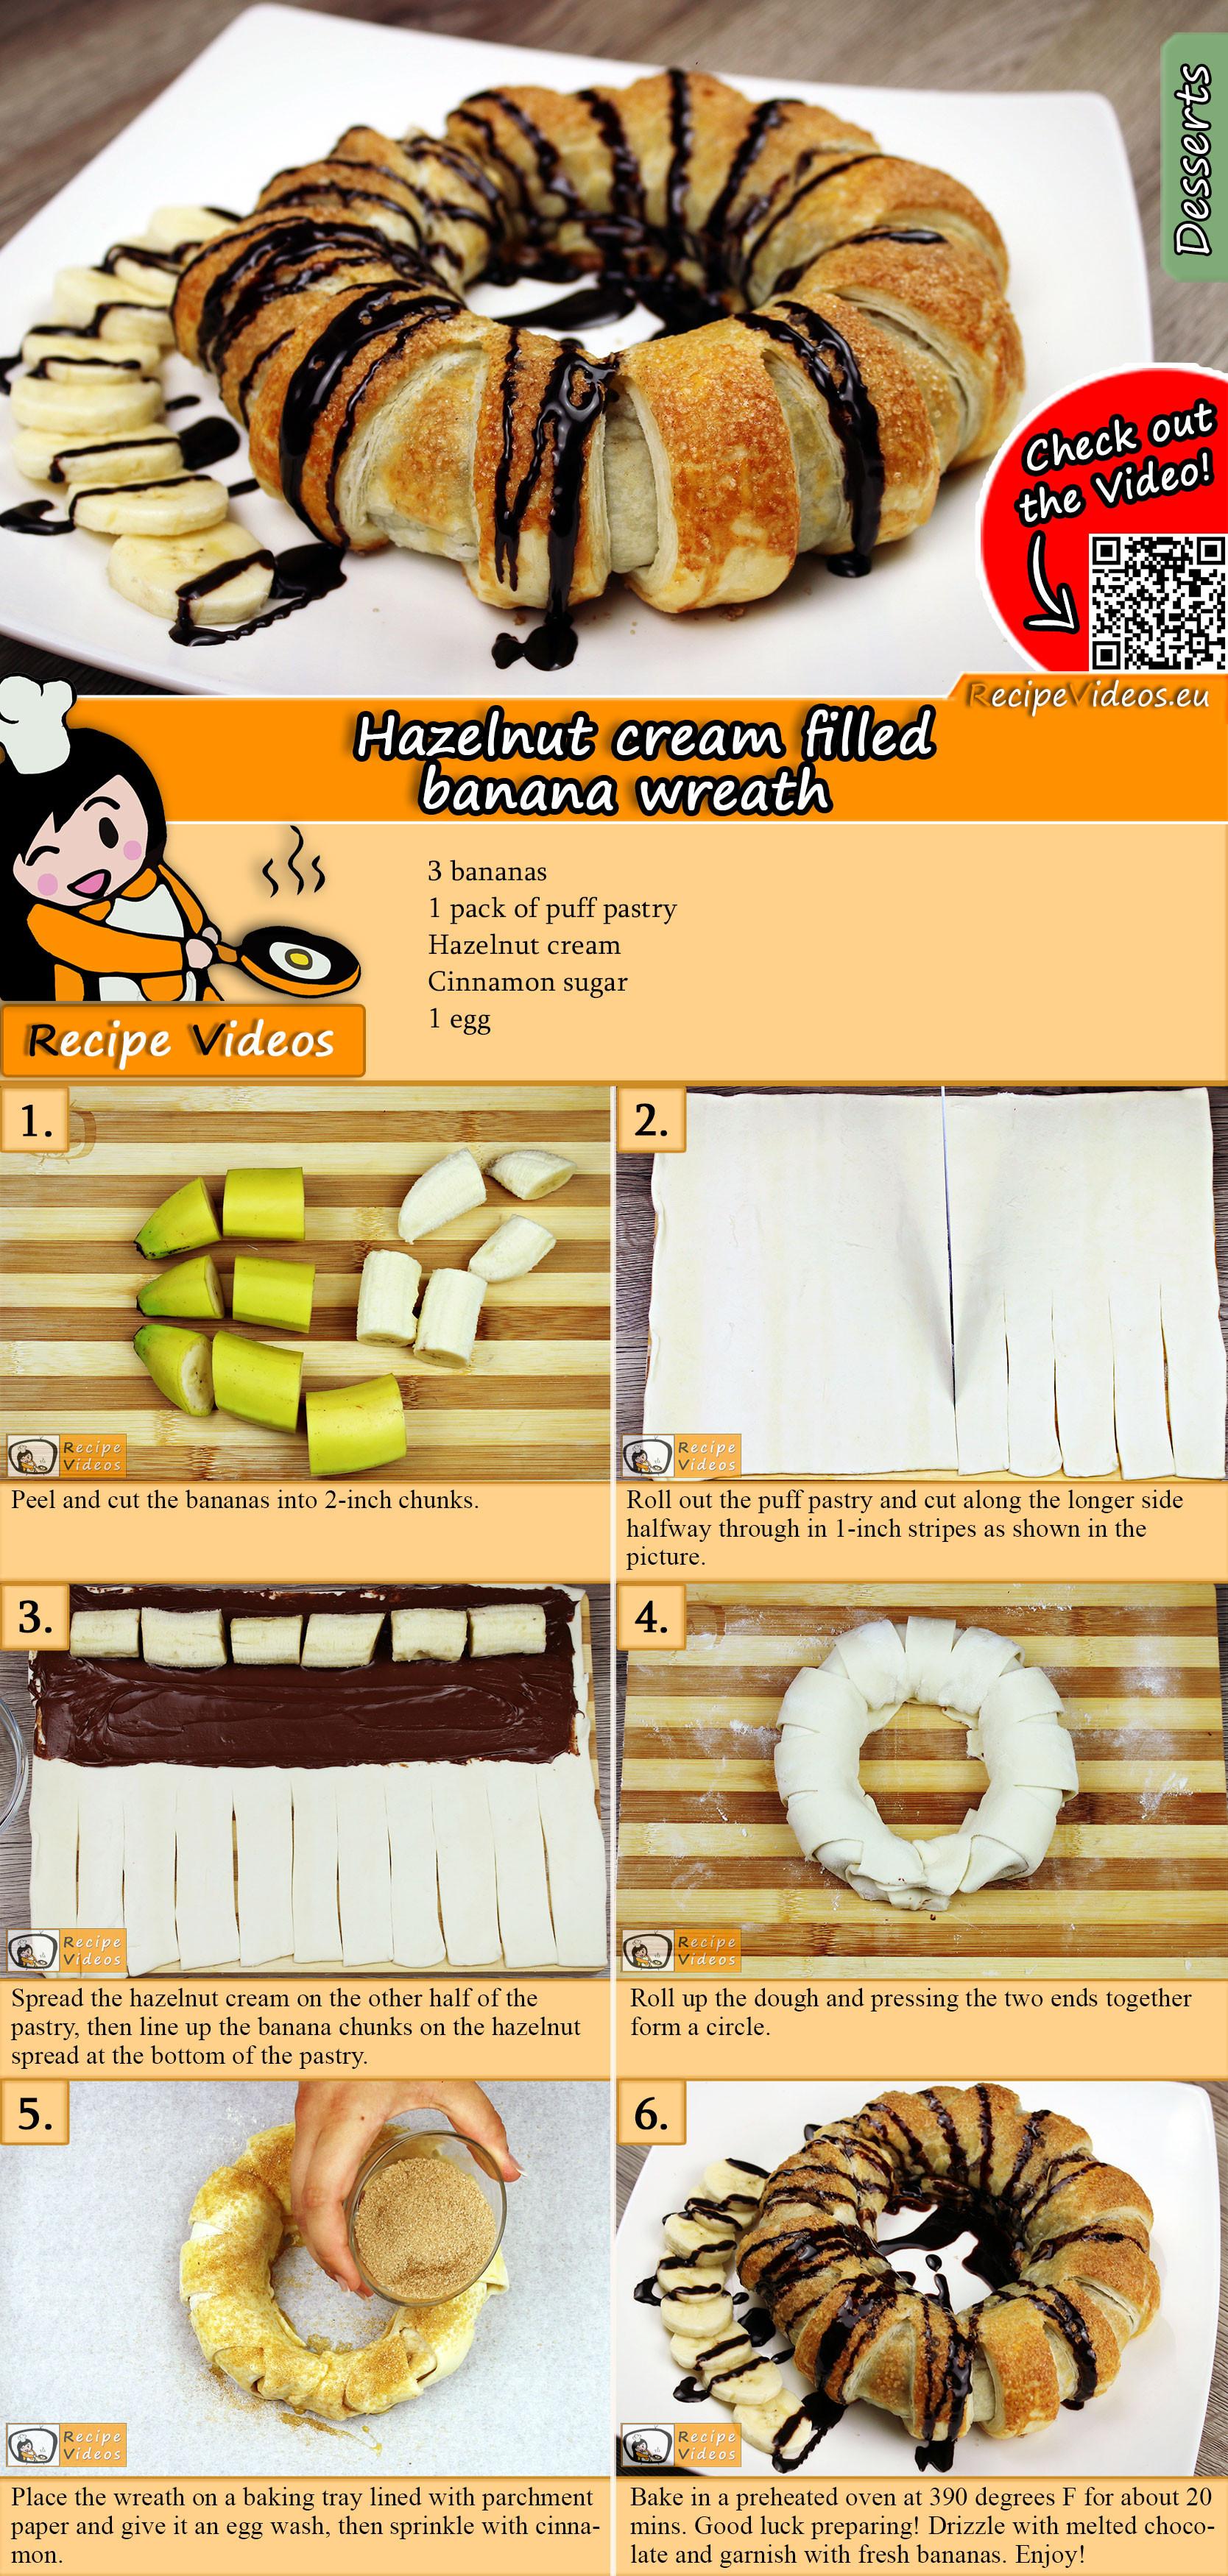 Hazelnut cream filled banana wreath recipe with video